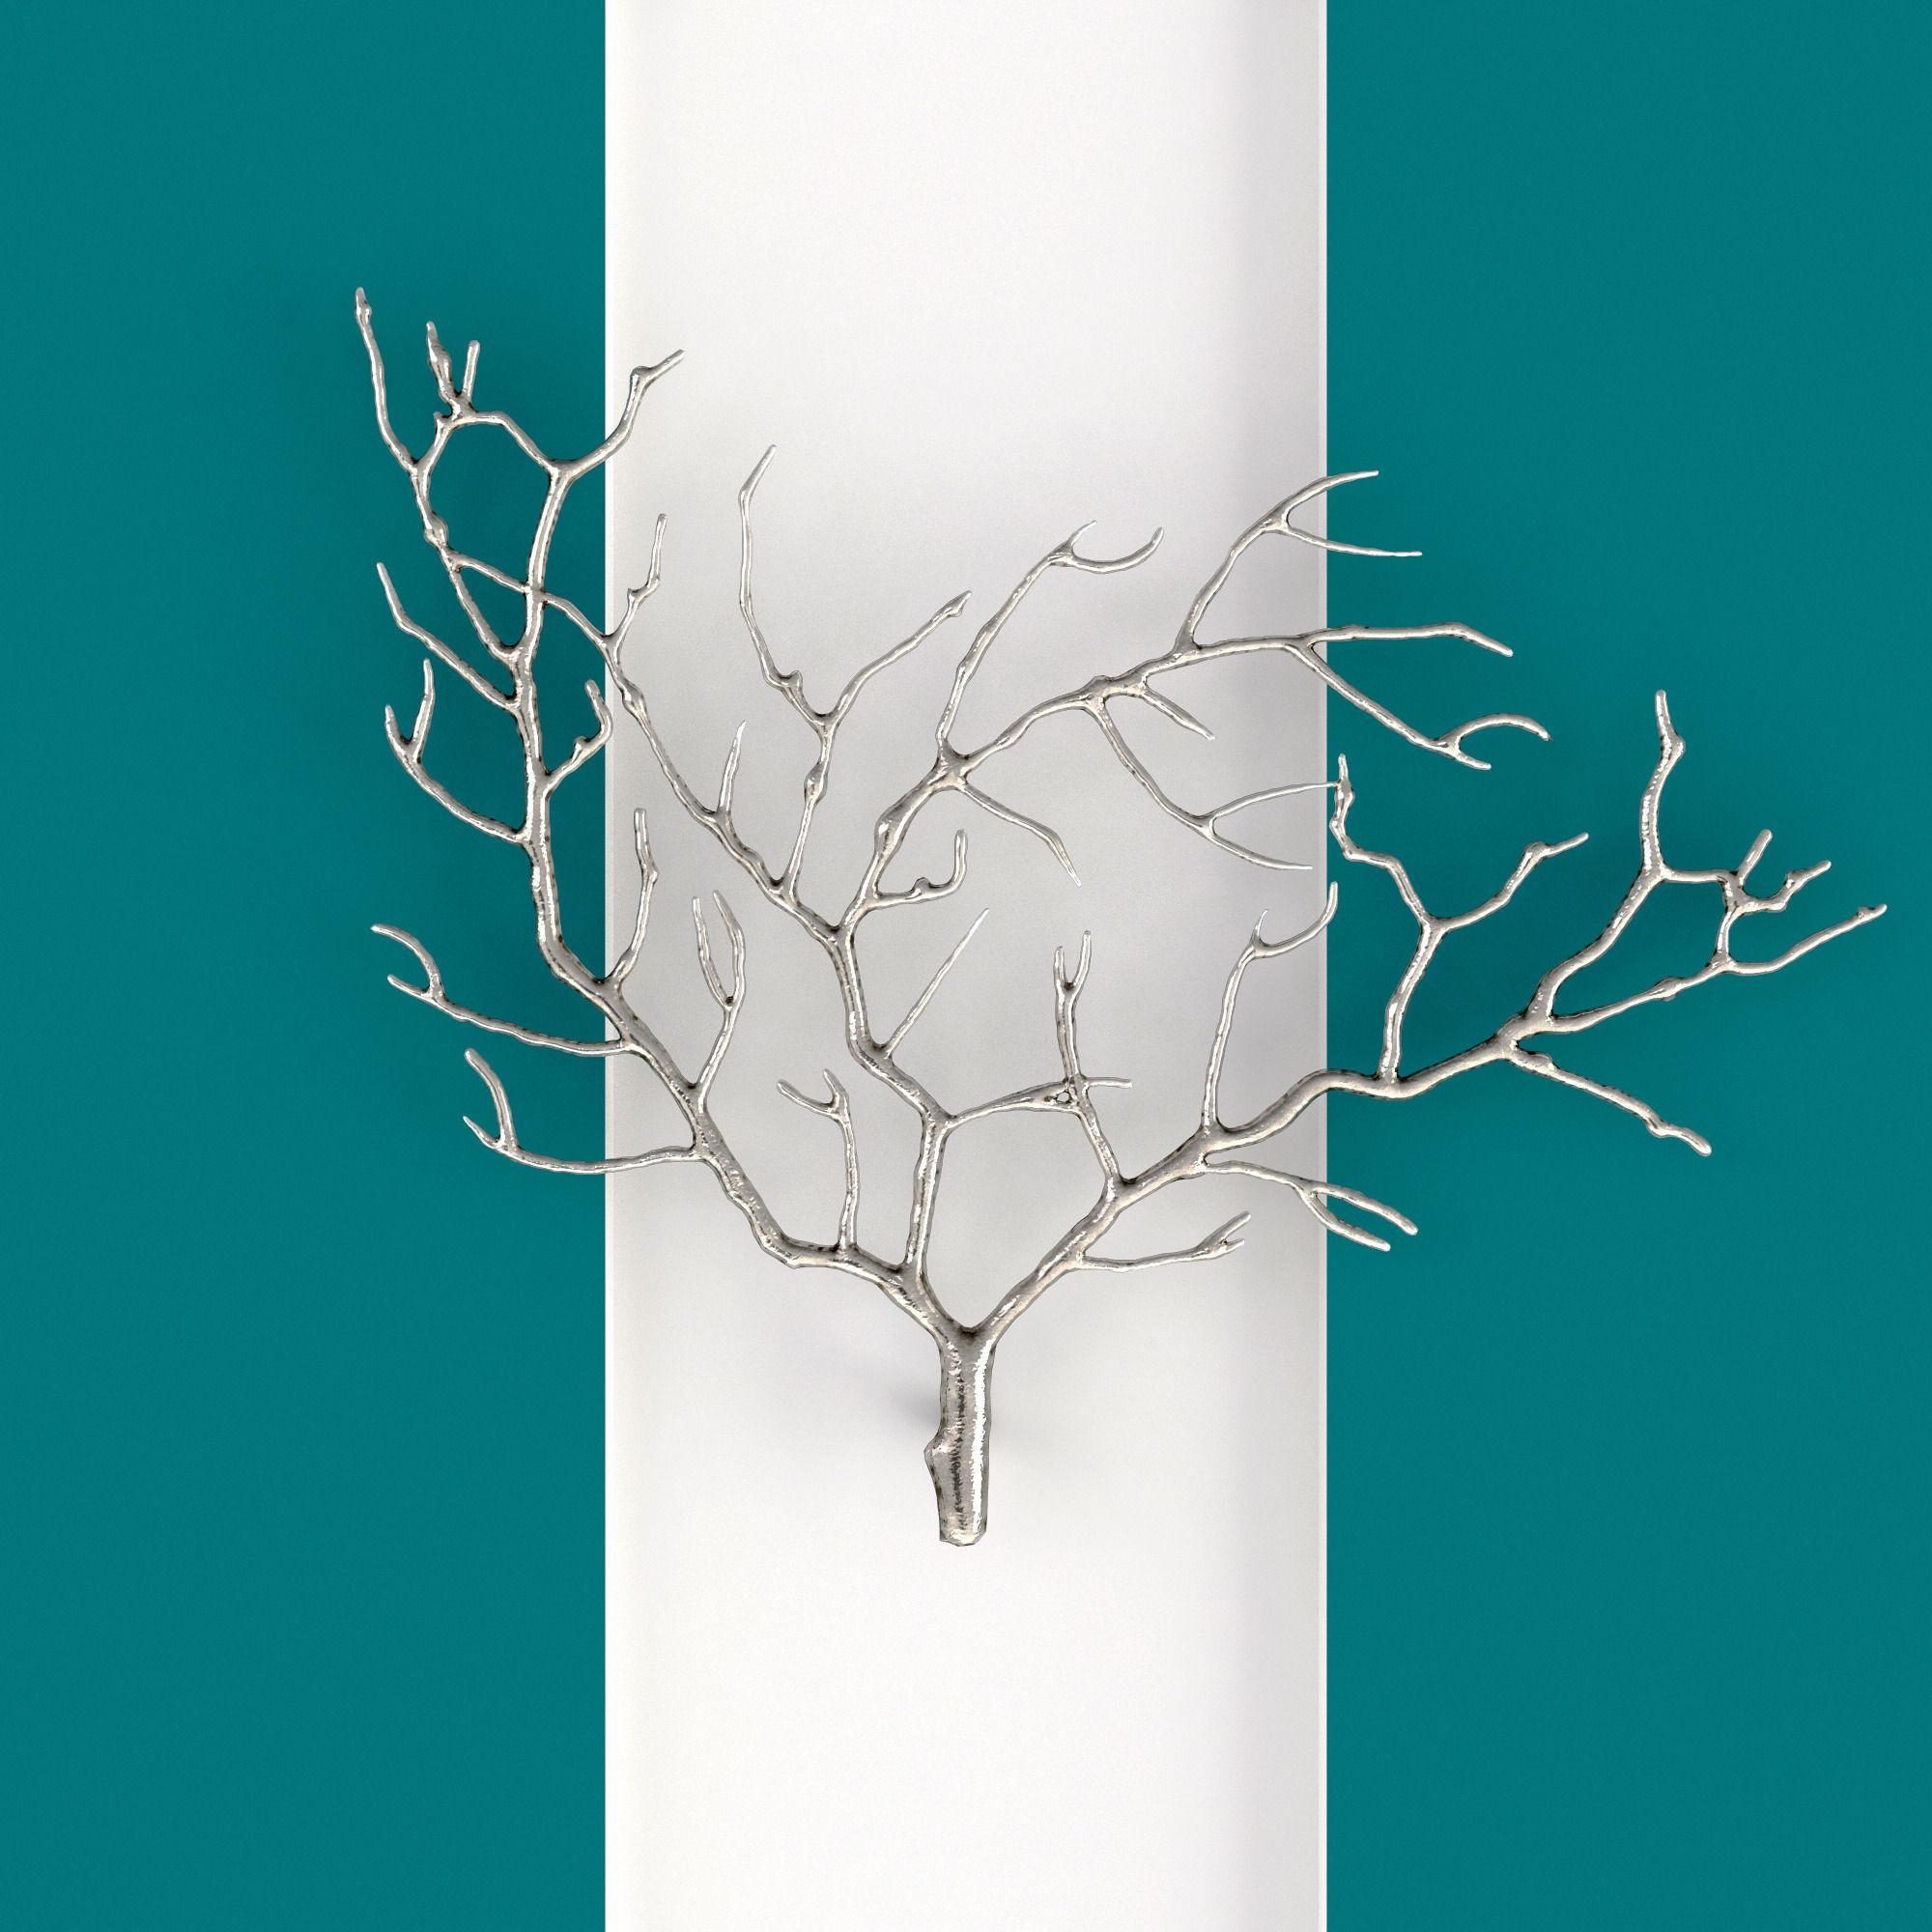 Metal Tree Branch Wall Sculpture 3D | Cgtrader Regarding 3D Tree Wall Art (View 19 of 20)